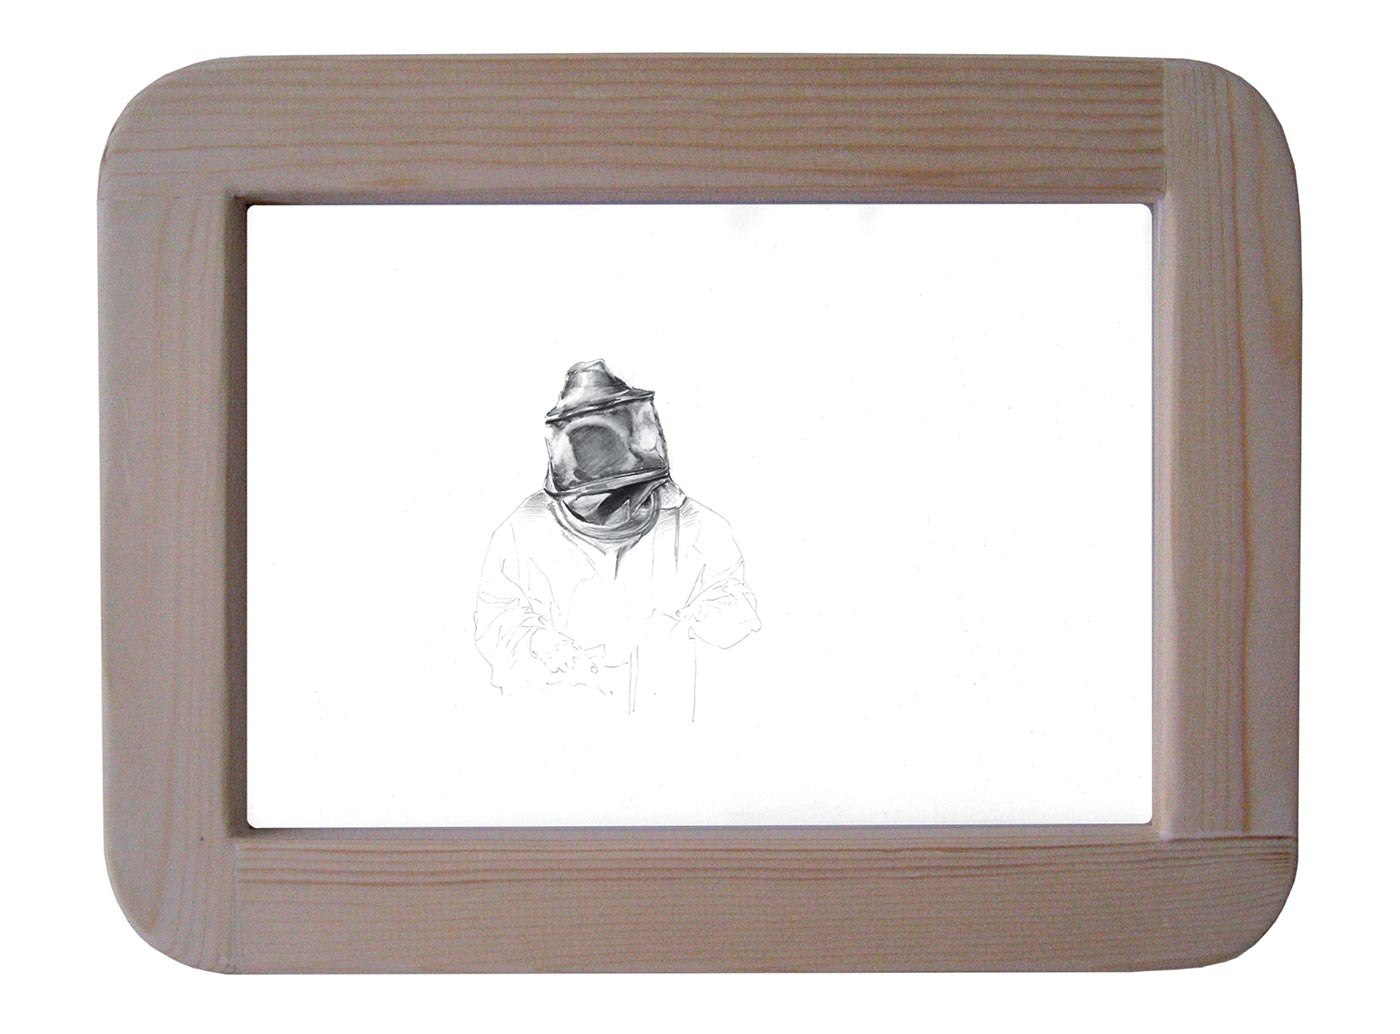 graphite on paper cm 38 x 27 x 3. 2008